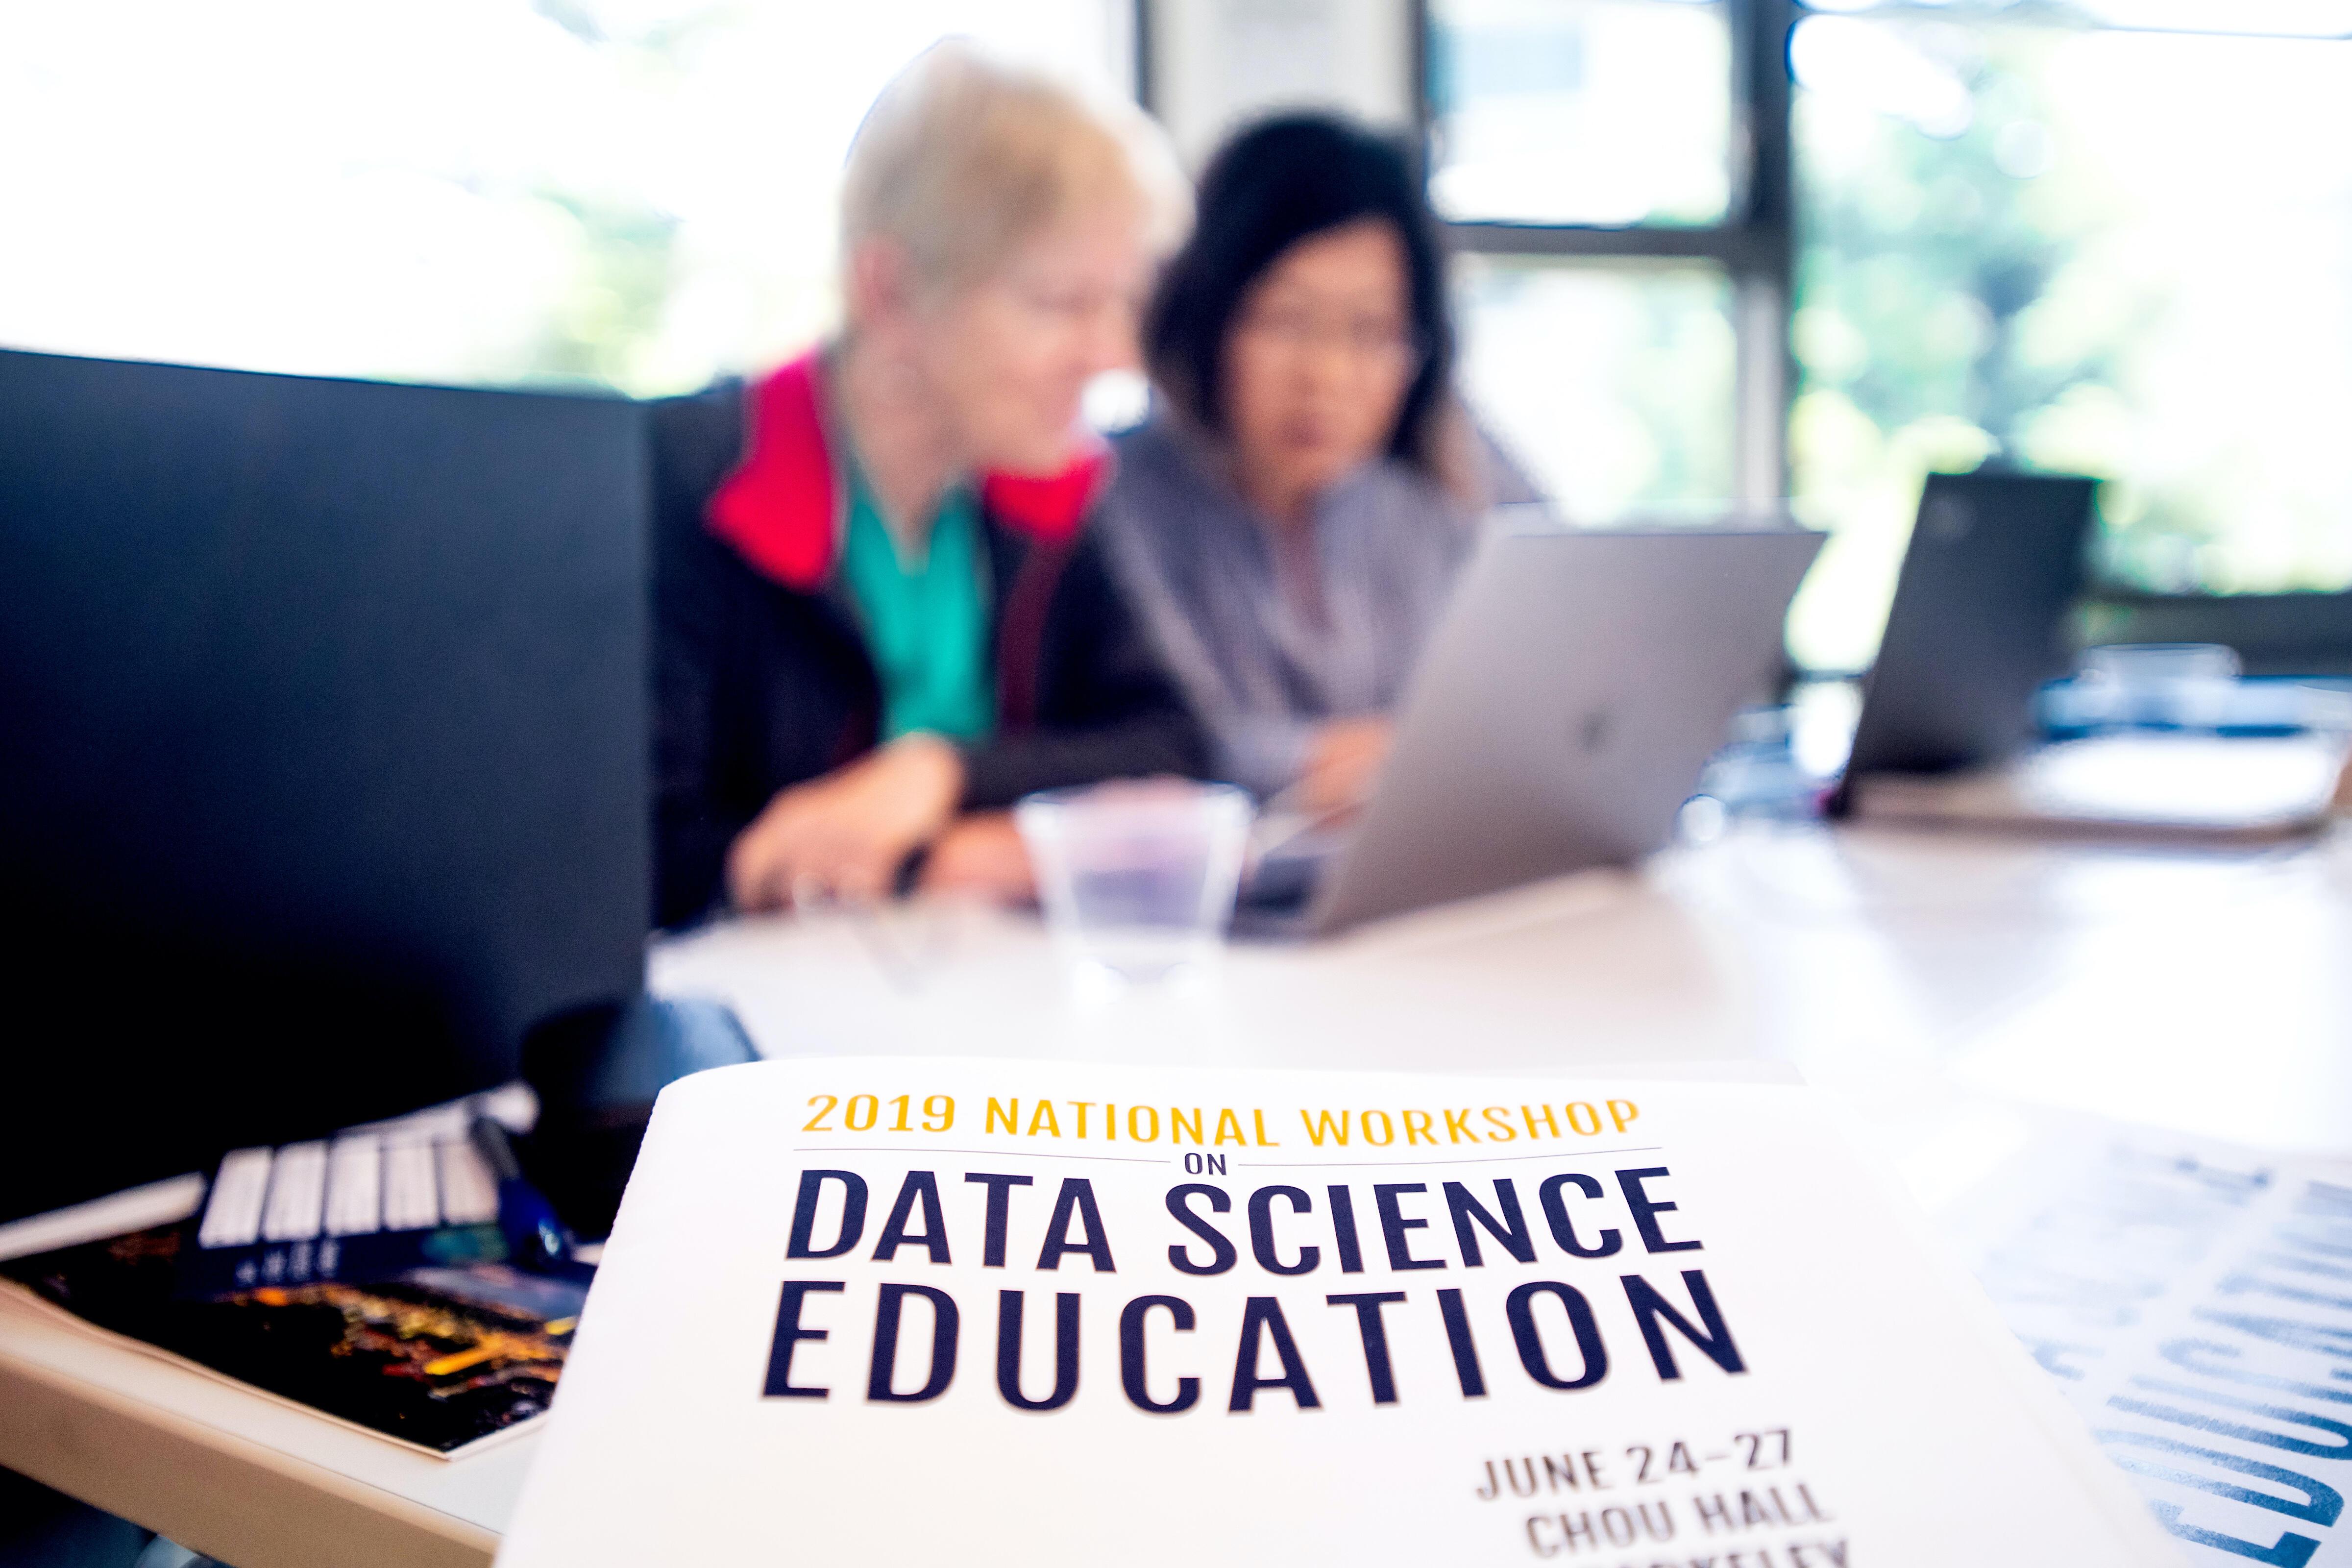 national data science education workshop 2019